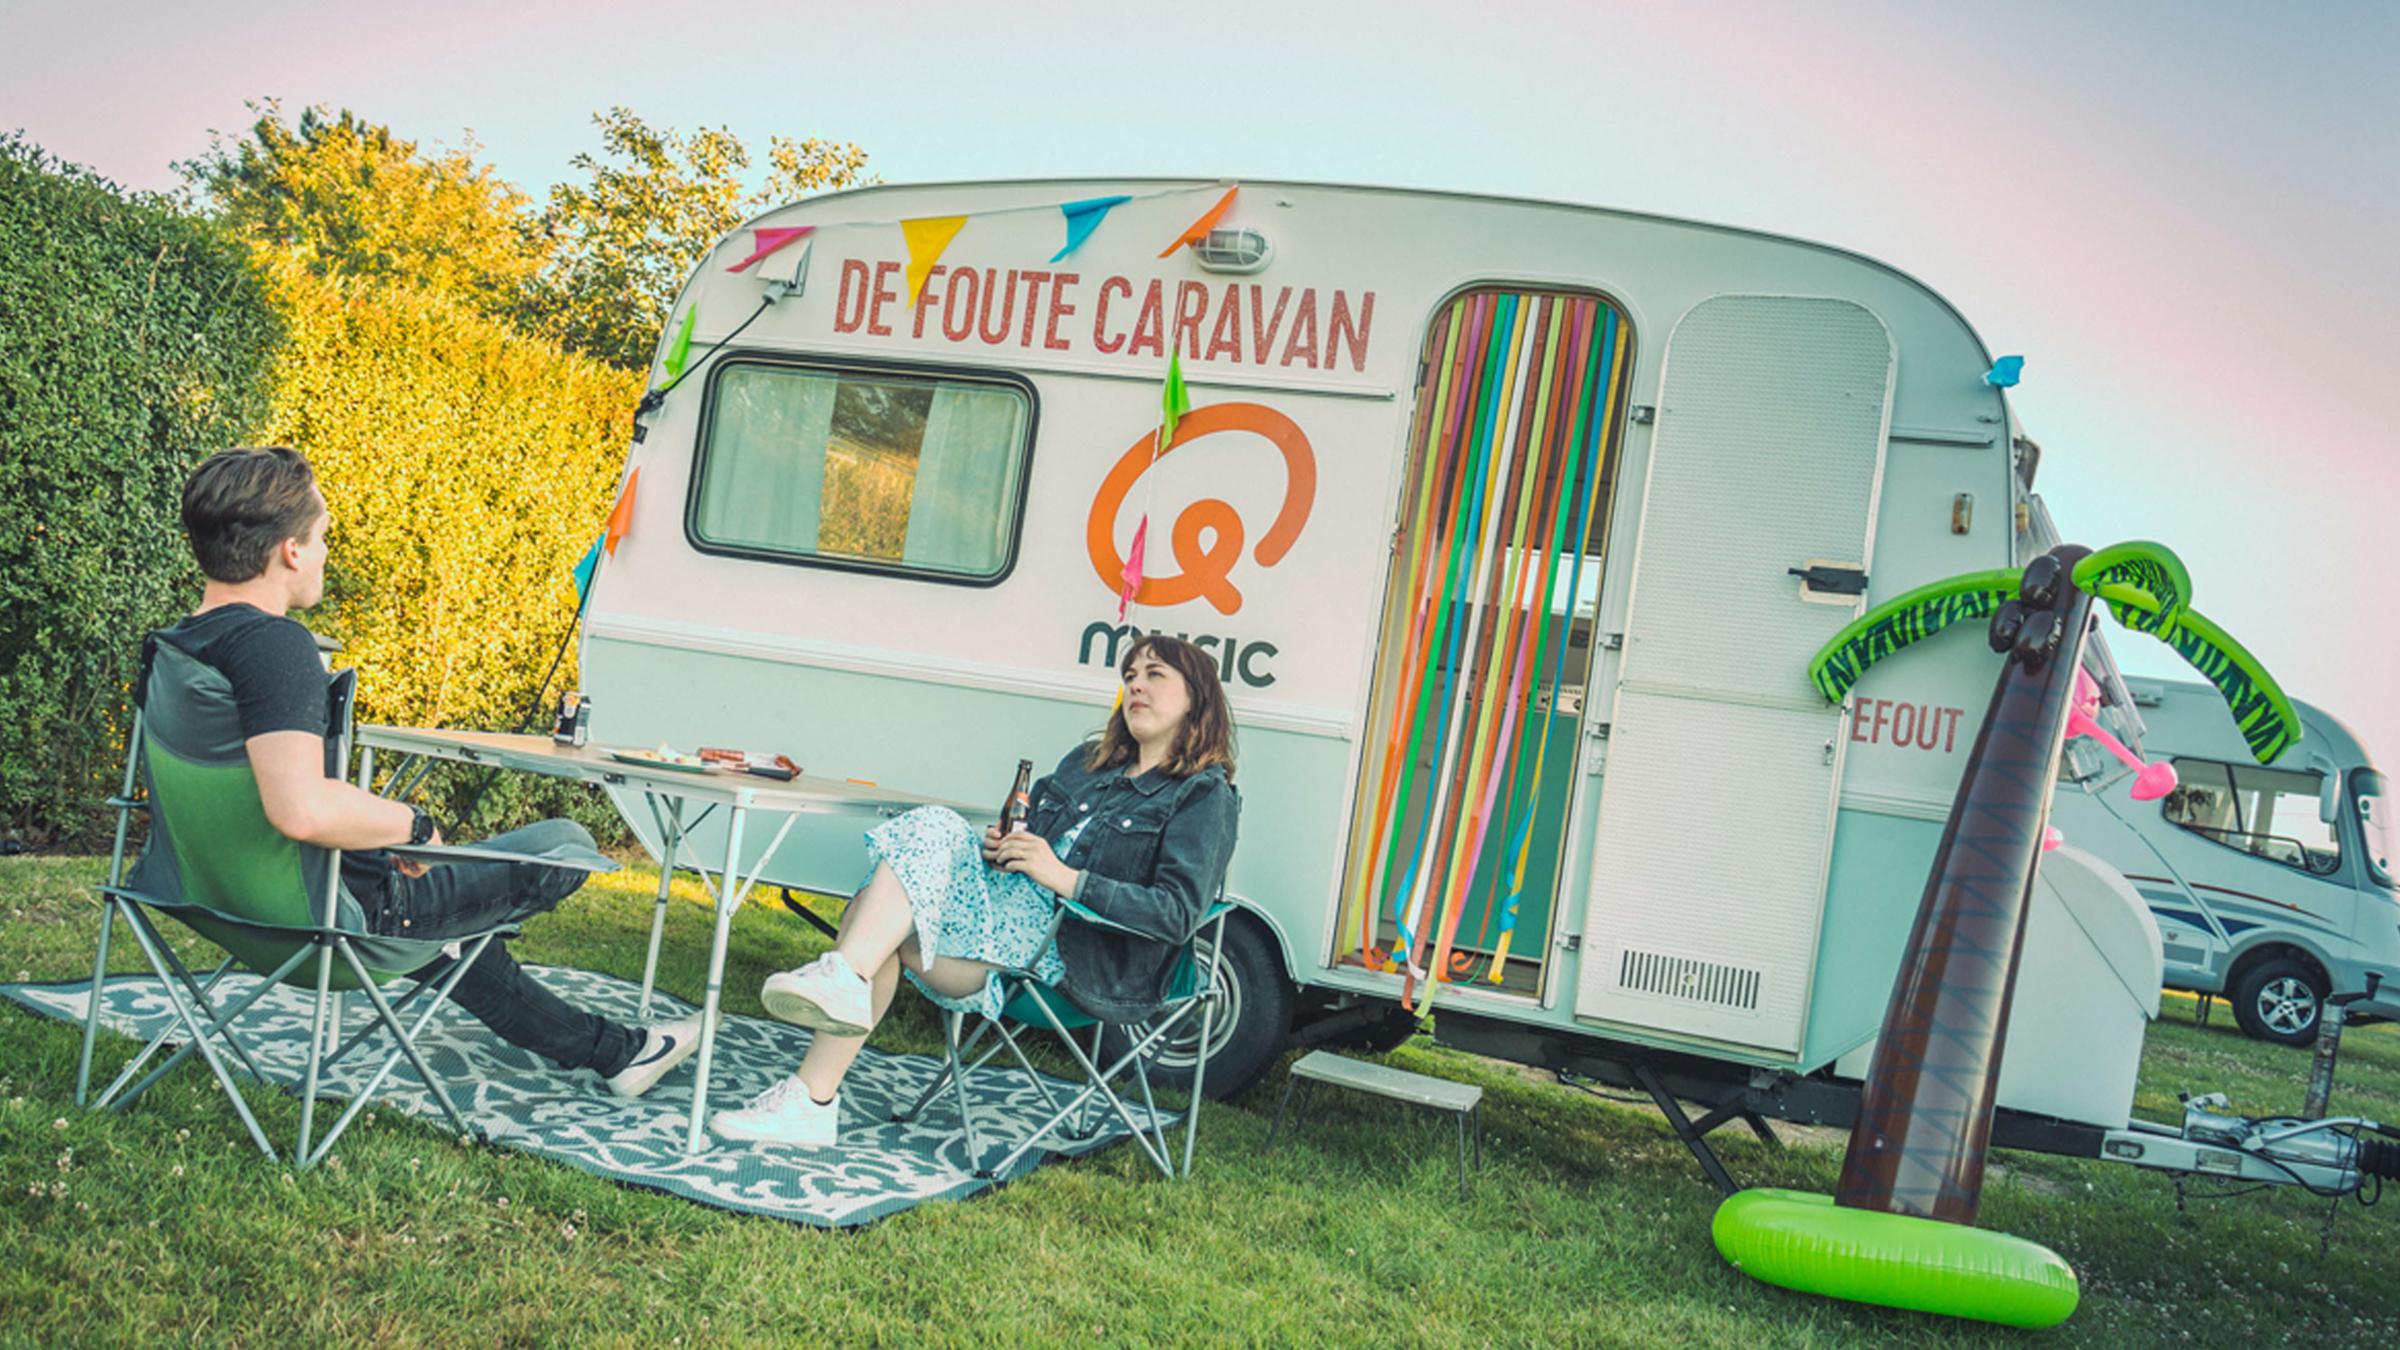 Caravan home